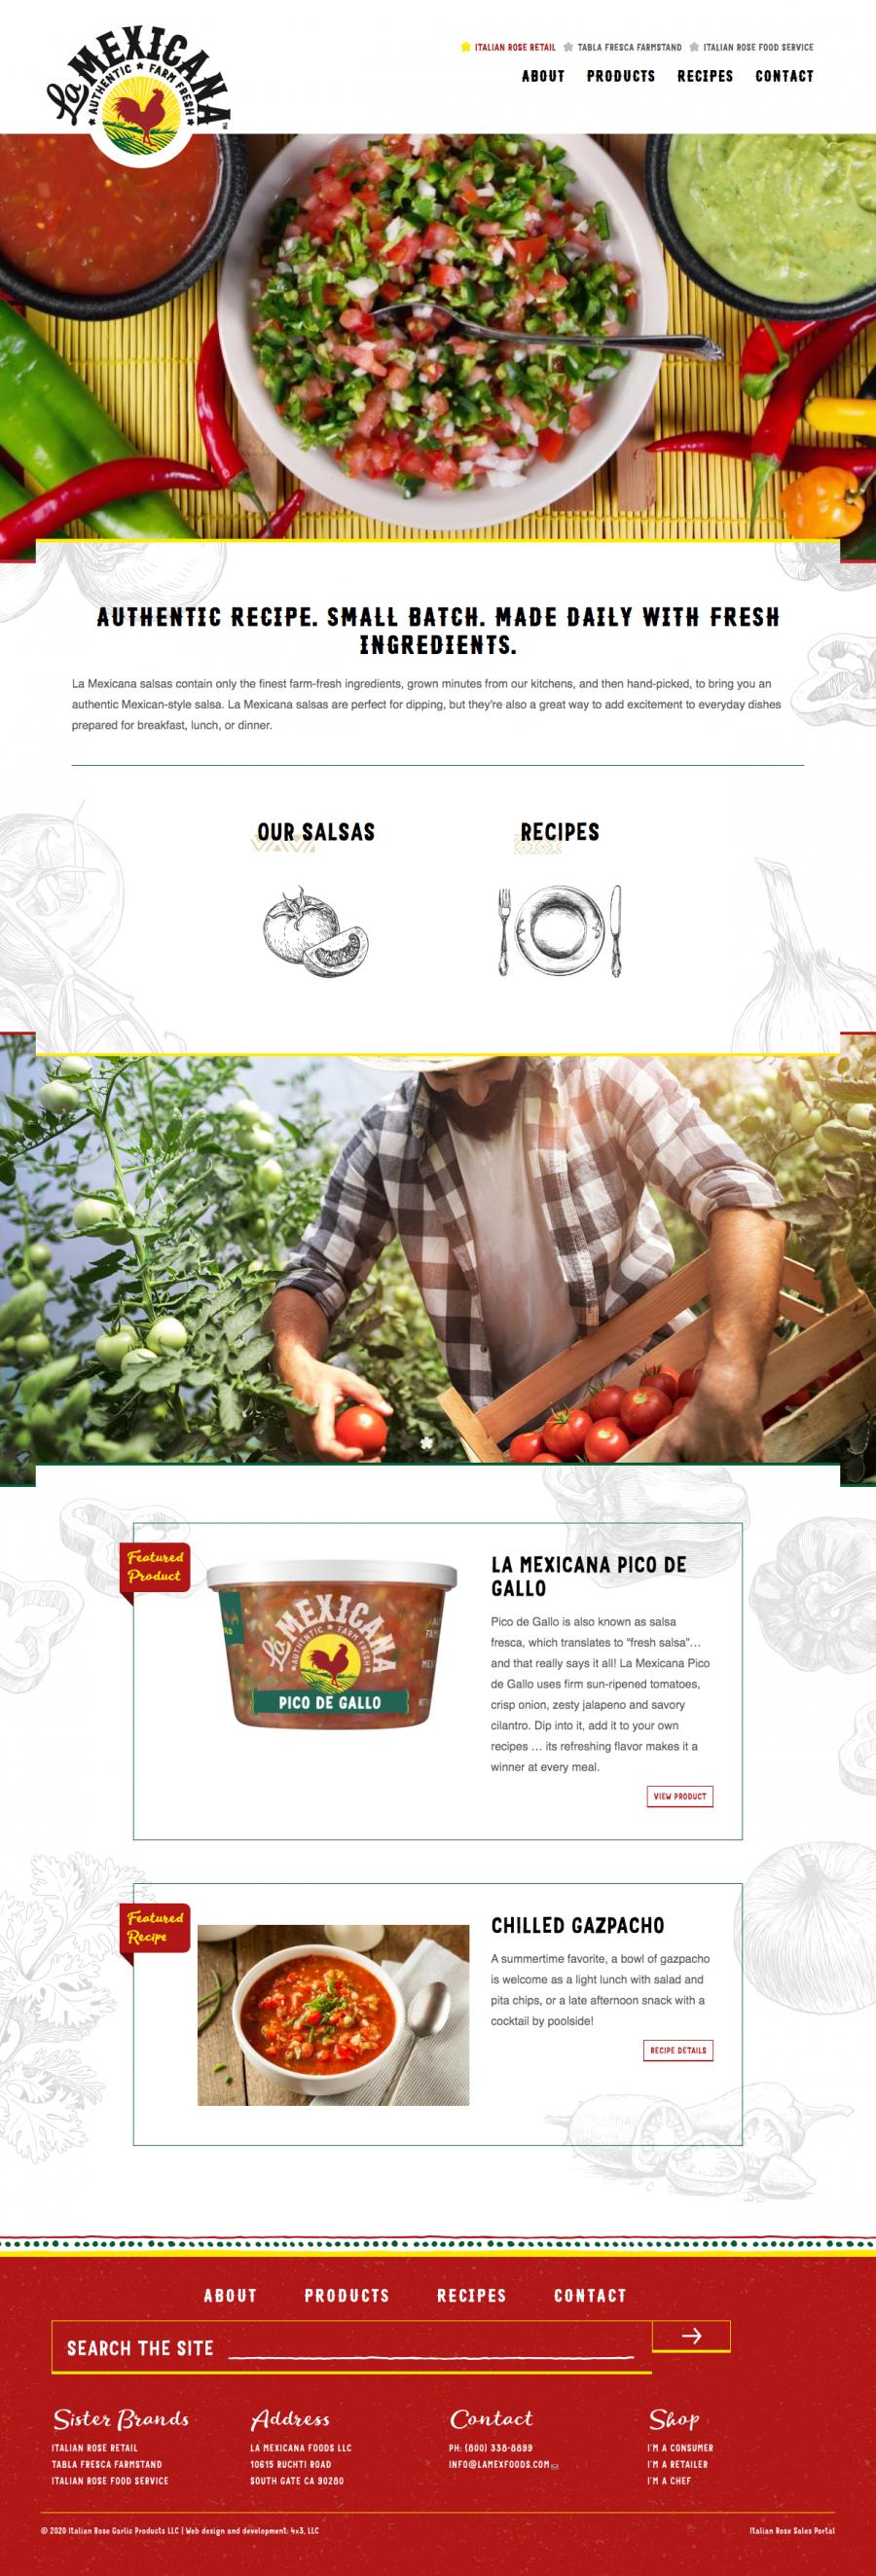 La Mexicana homepage